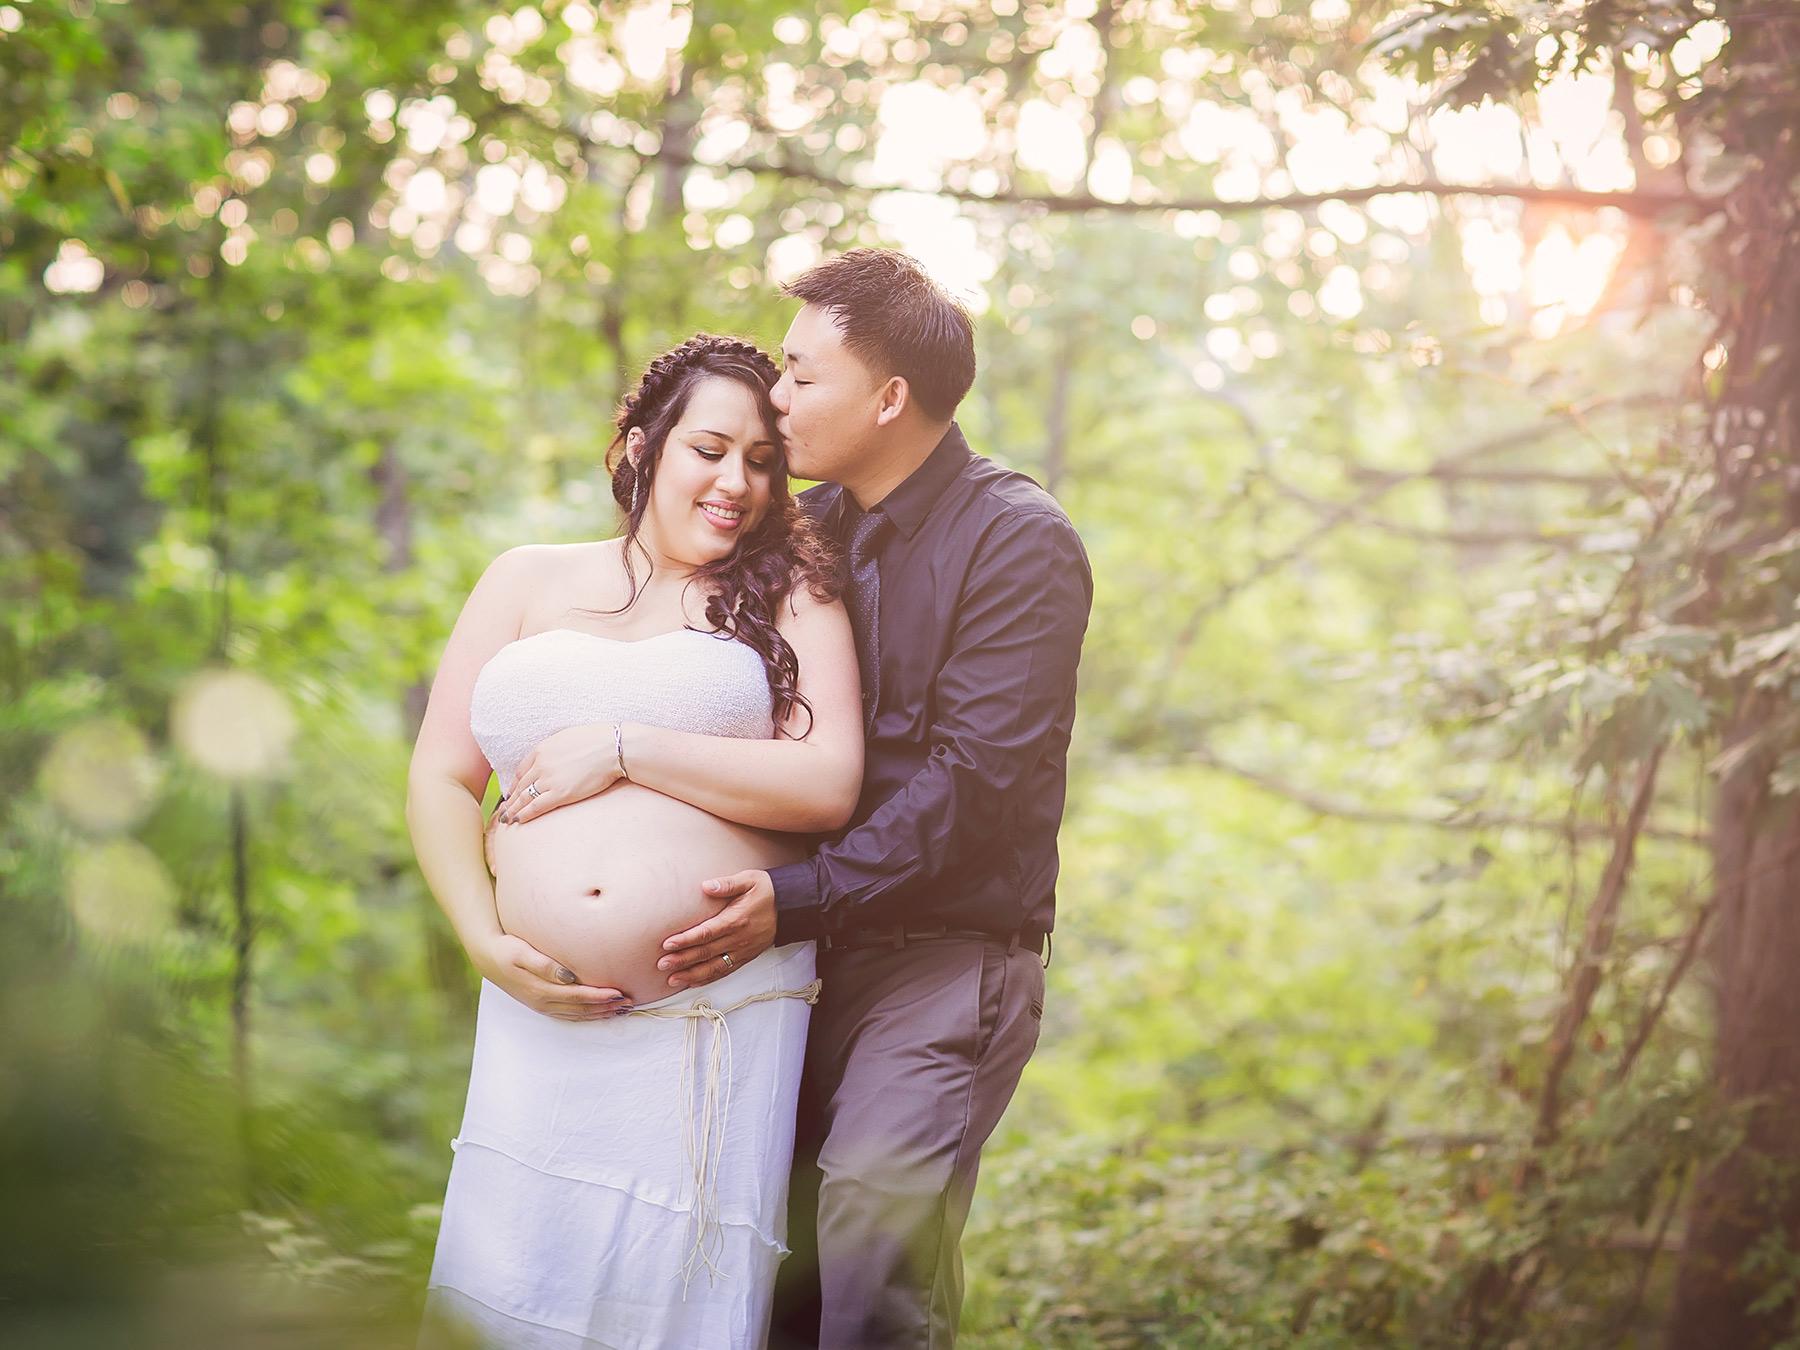 Newborn-photographers-maternity-photographers-berks-county-pa_F